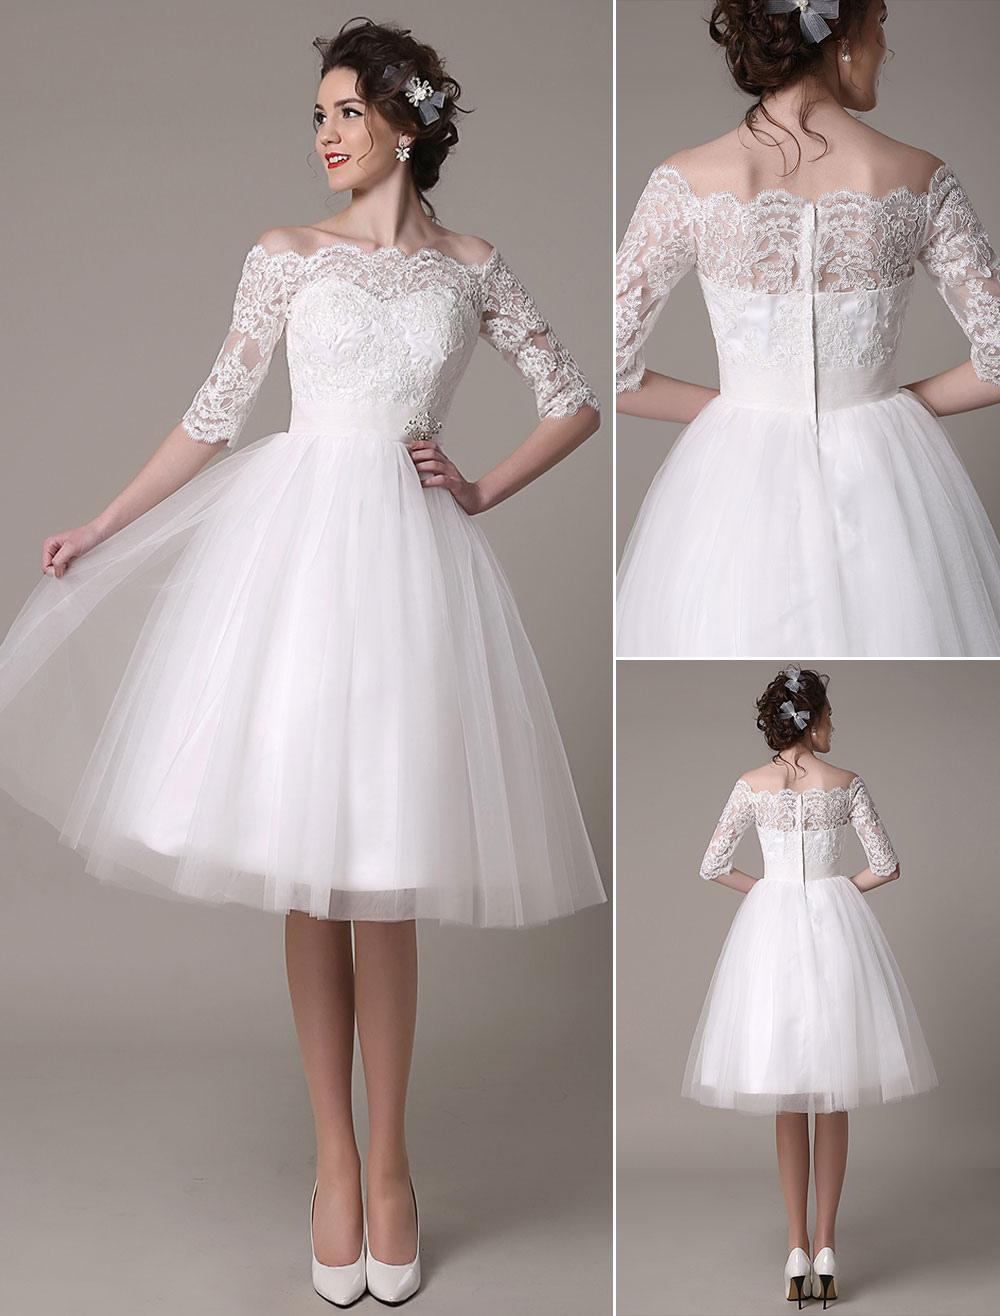 lace wedding dress a line knee length waist rhinestone bridal dress milanoo. Black Bedroom Furniture Sets. Home Design Ideas